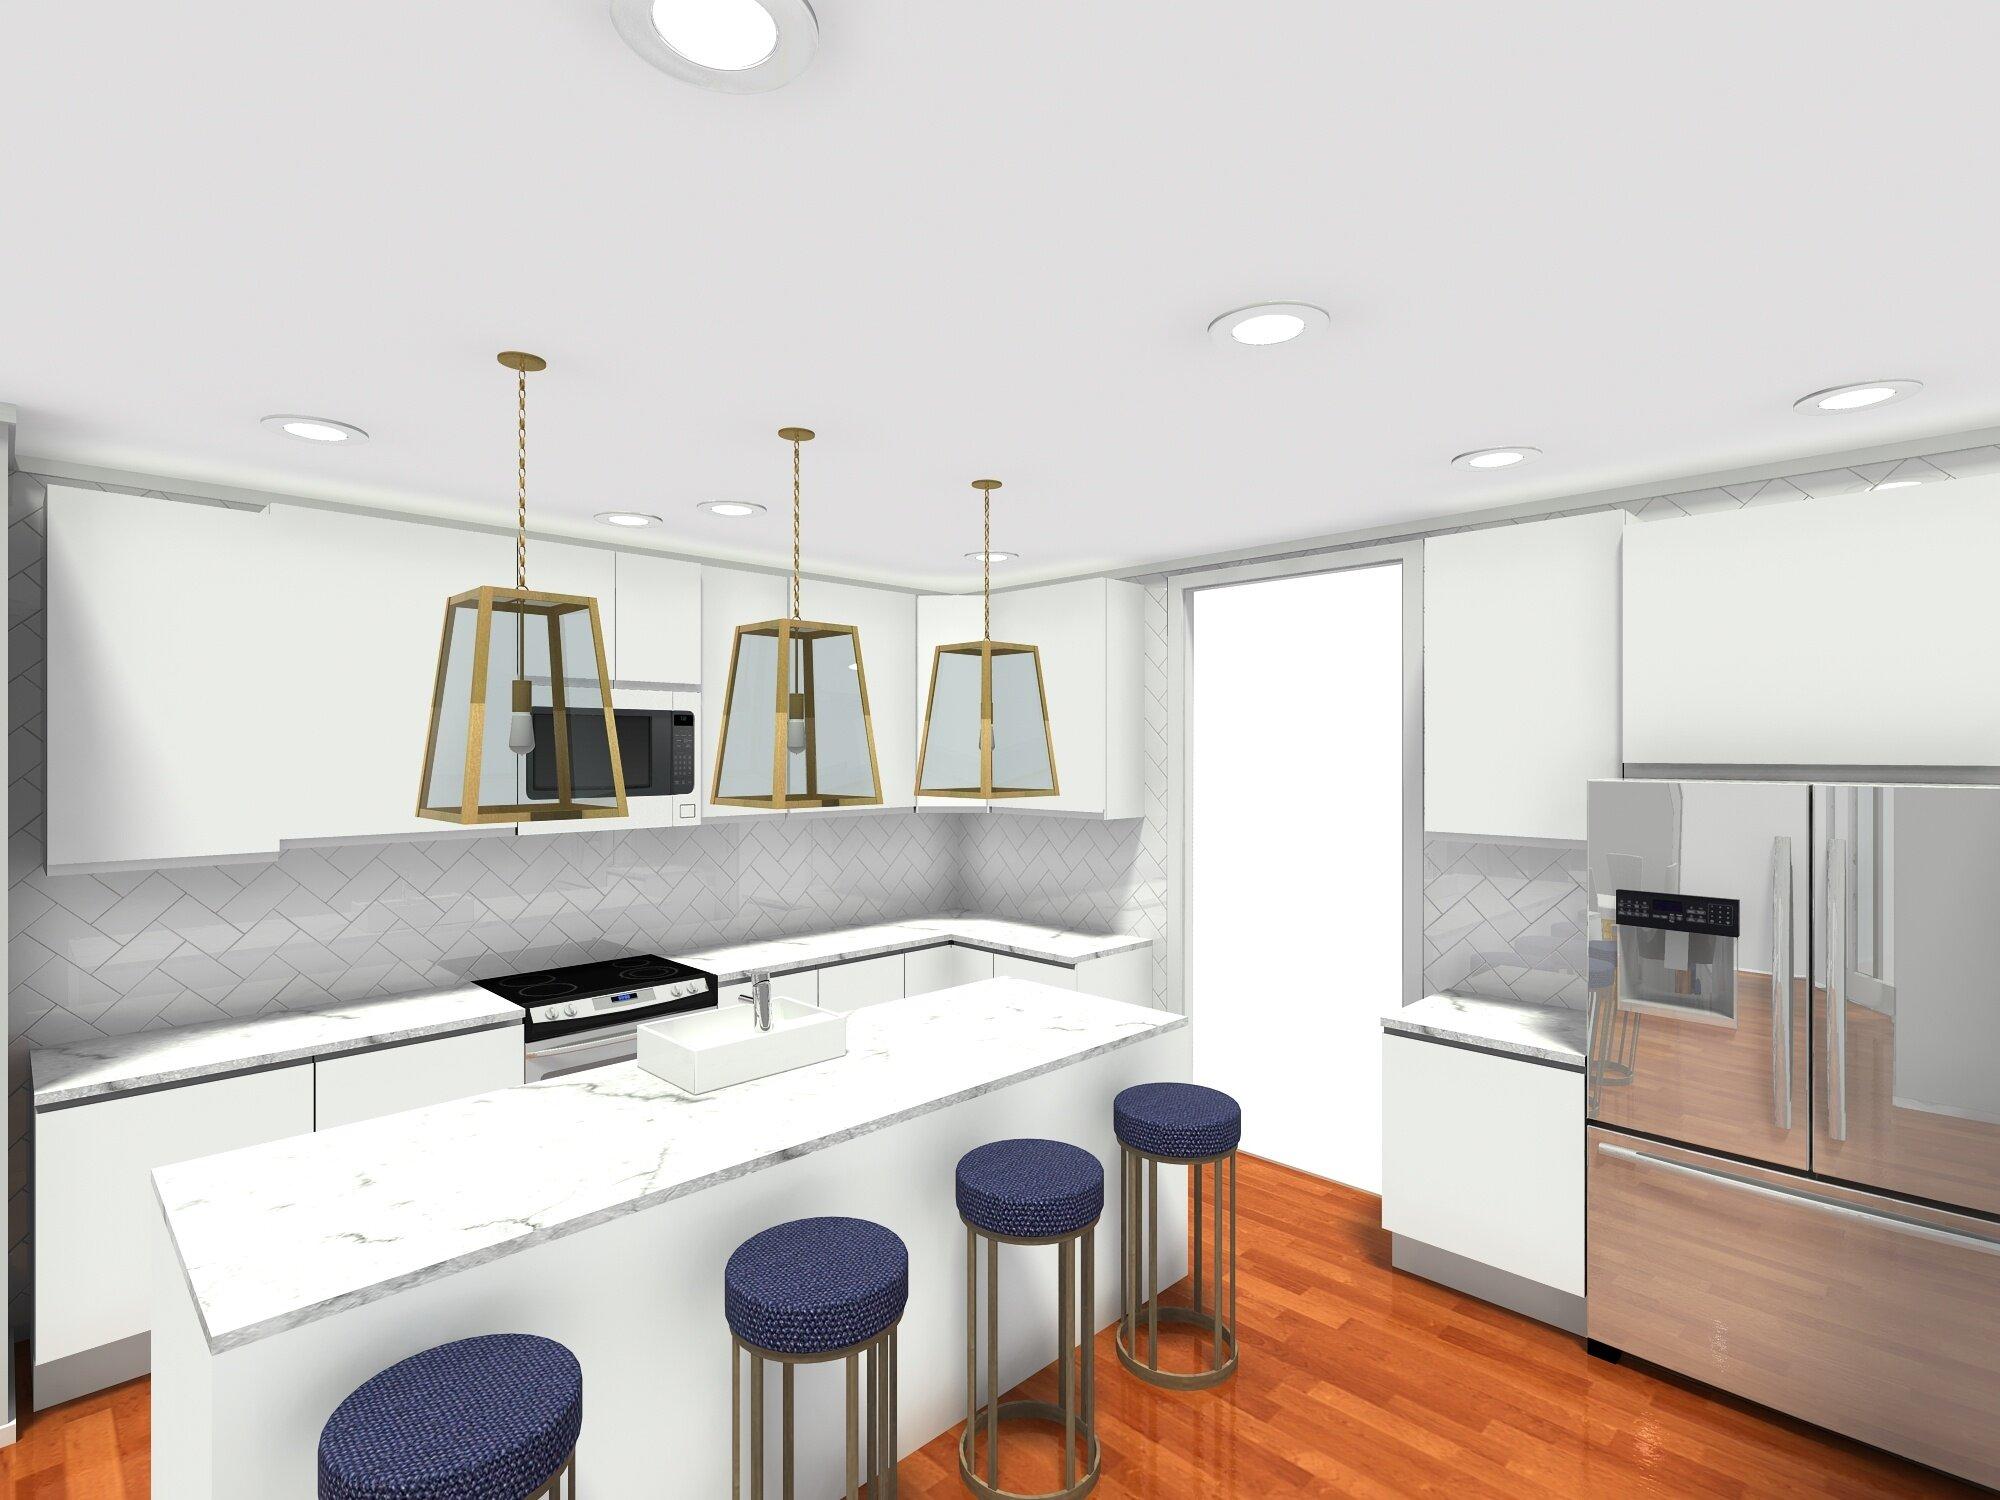 Project: Kotok Kitchen